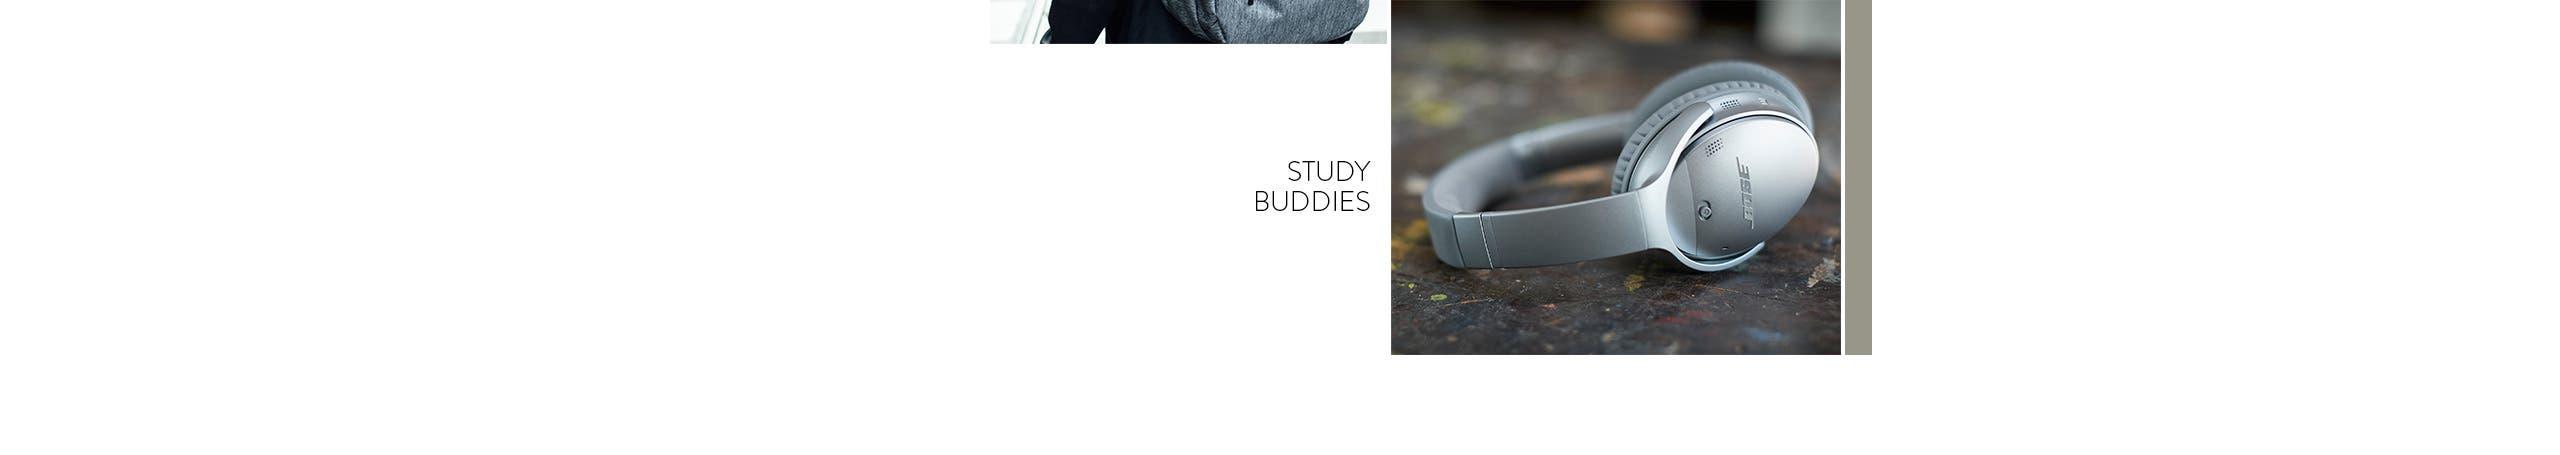 Study buddies.